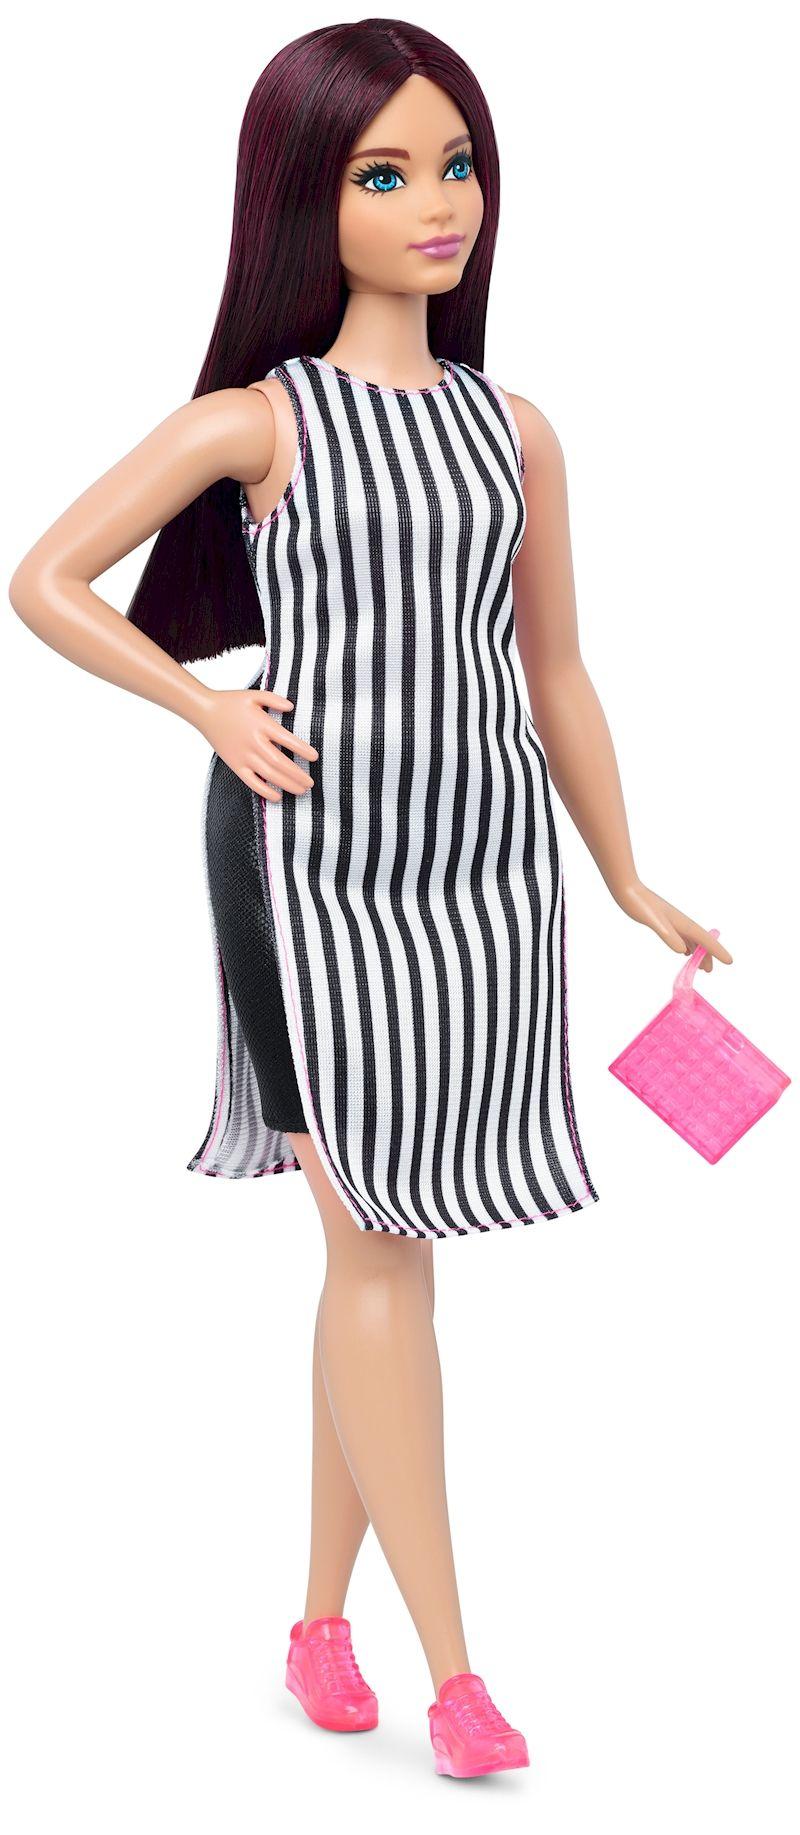 Barbie® Fashionistas™ 38 So Sporty Doll & Fashions - Curvy ...